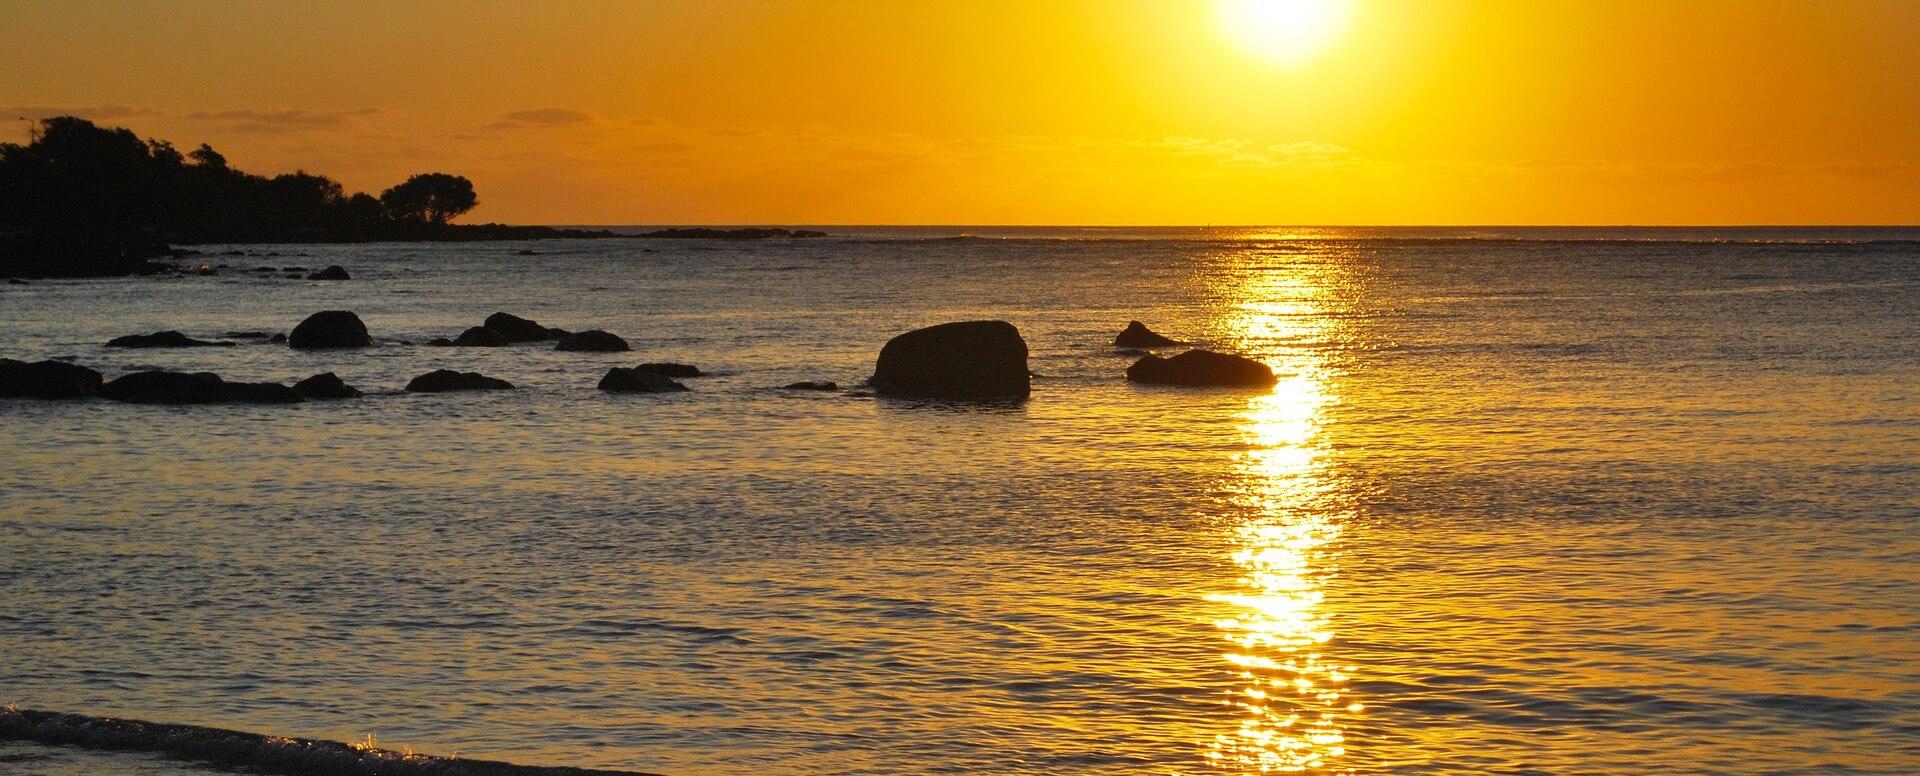 Balade à cheval au soleil couchant - Île Maurice